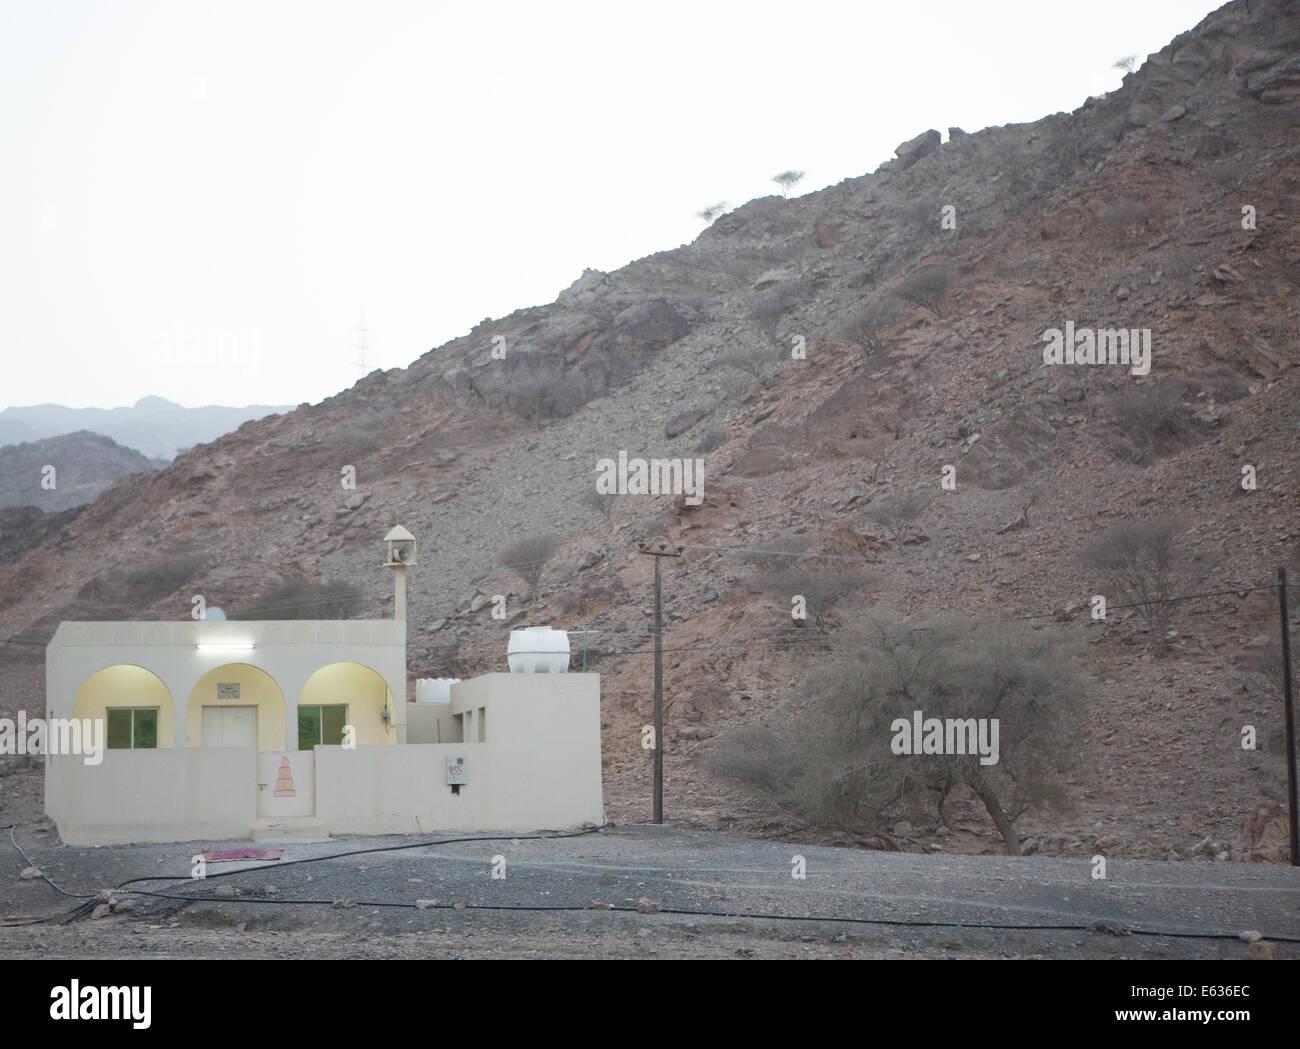 Road side mosque at dusk, Dibba, Fujairah, United Arab Emirates - Stock Image